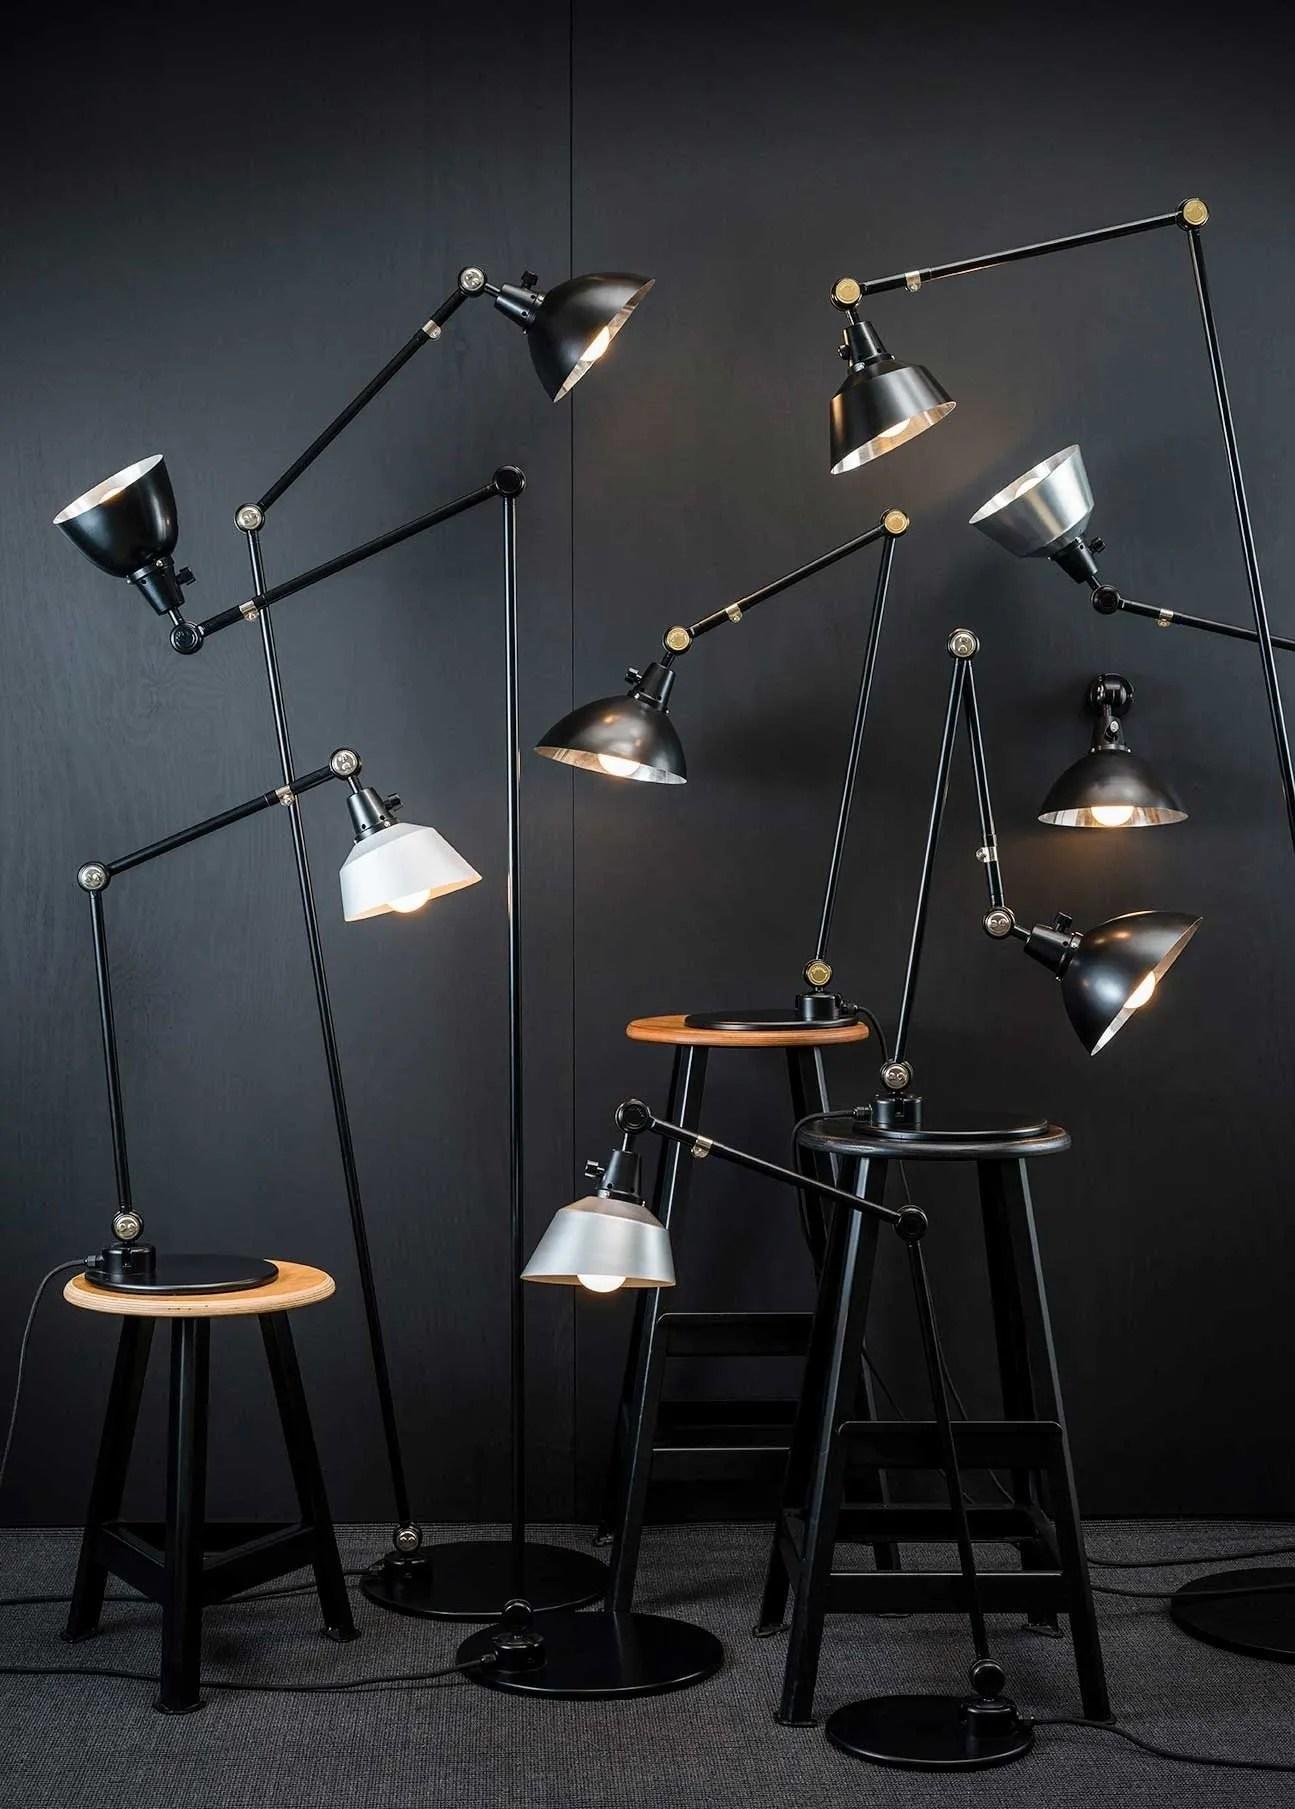 Midgard vloerlamp modulair totaal